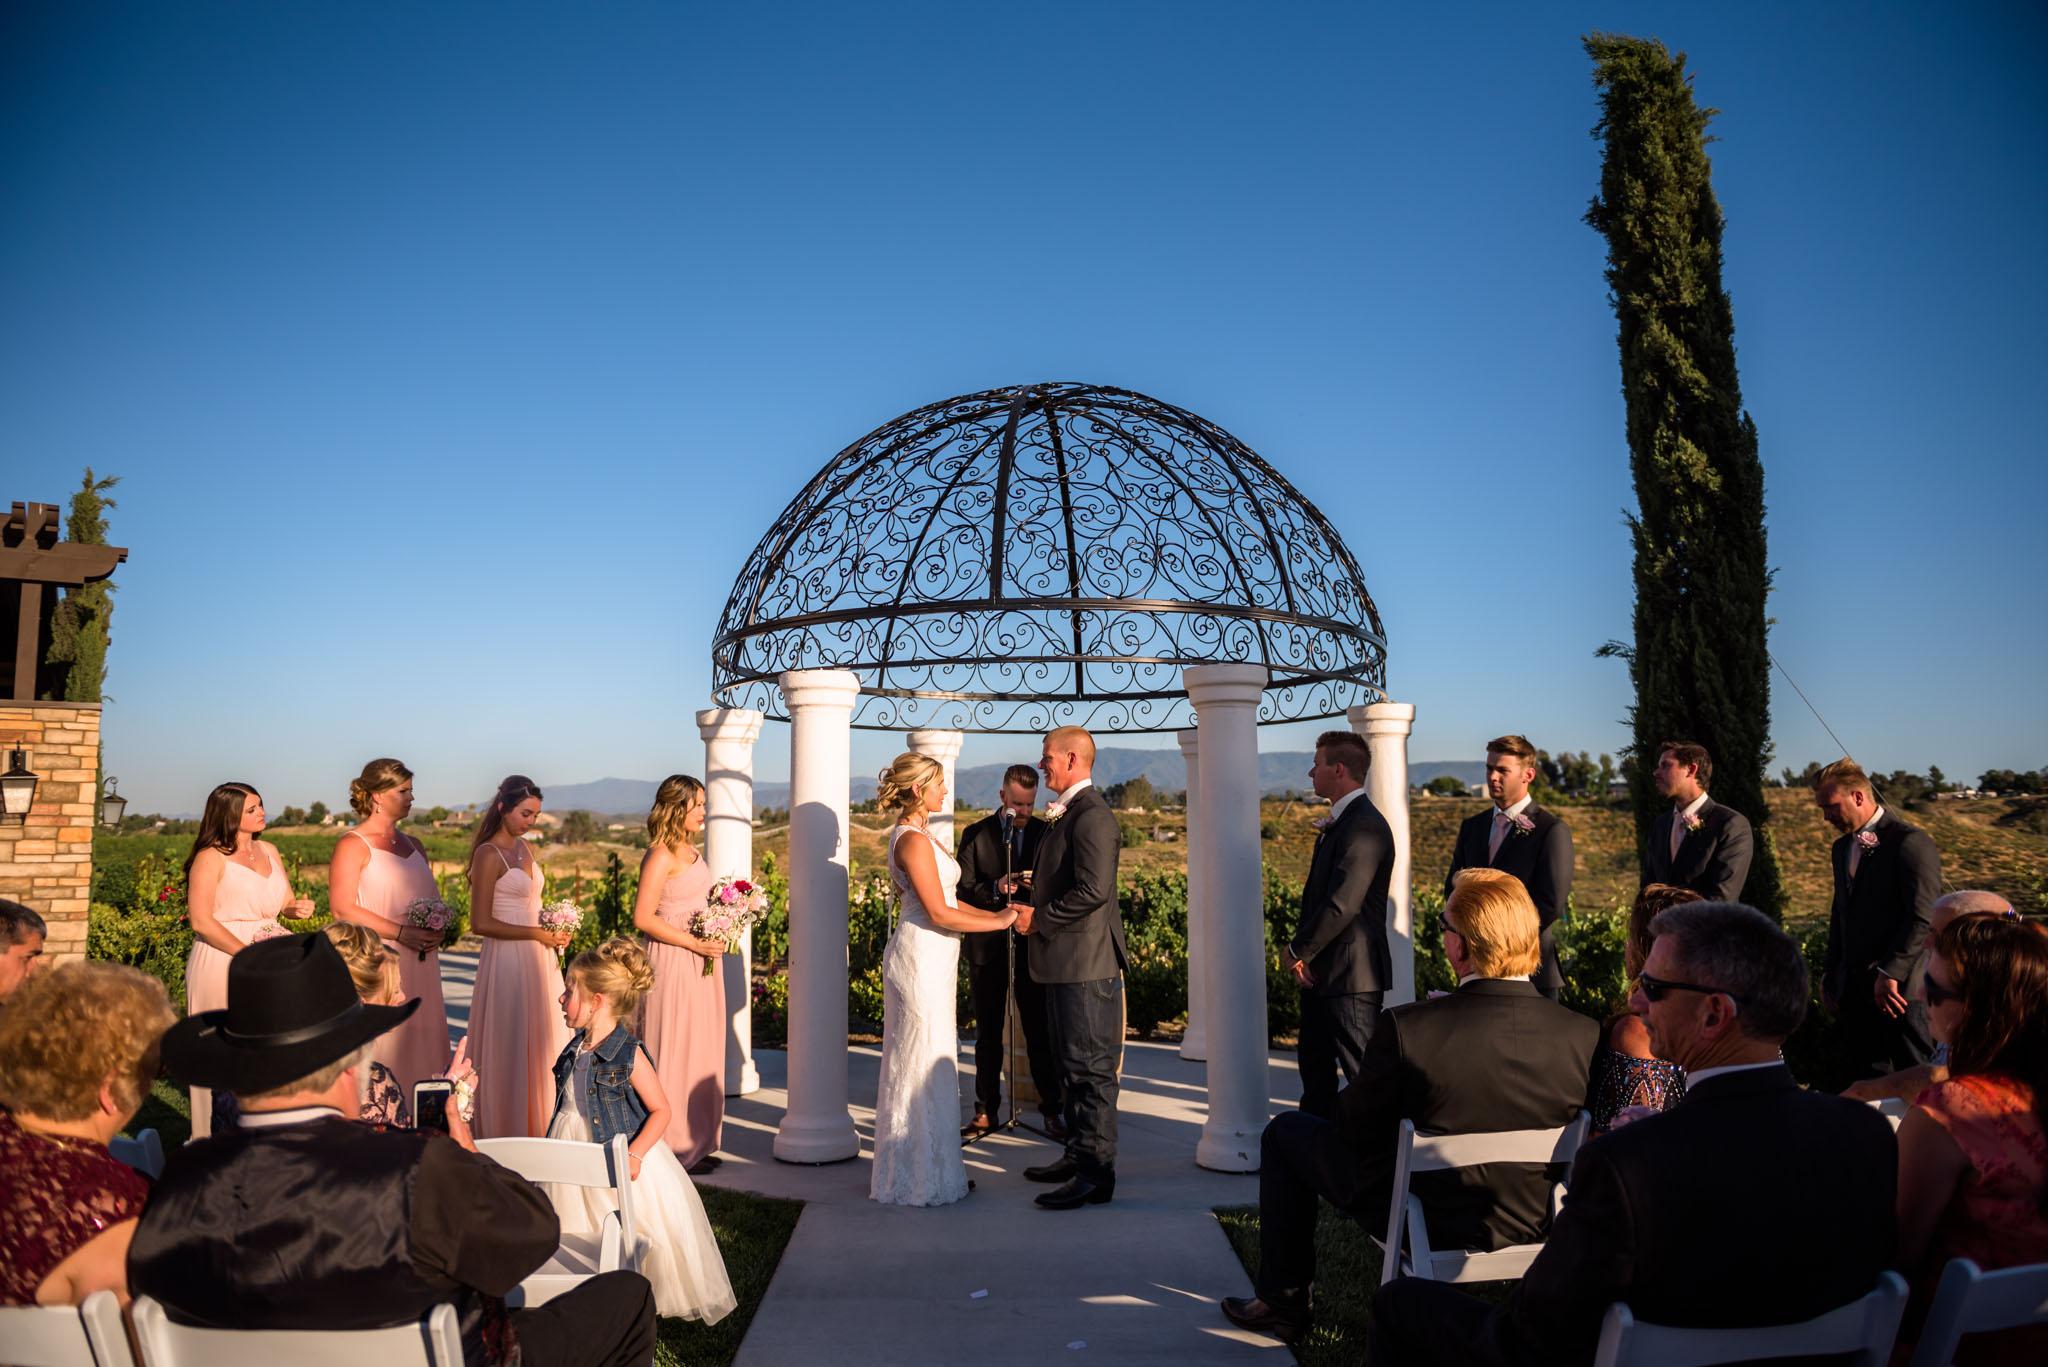 Avensole-Winery-Temecula-Wedding-Josh-and-Olivia-3550.JPG